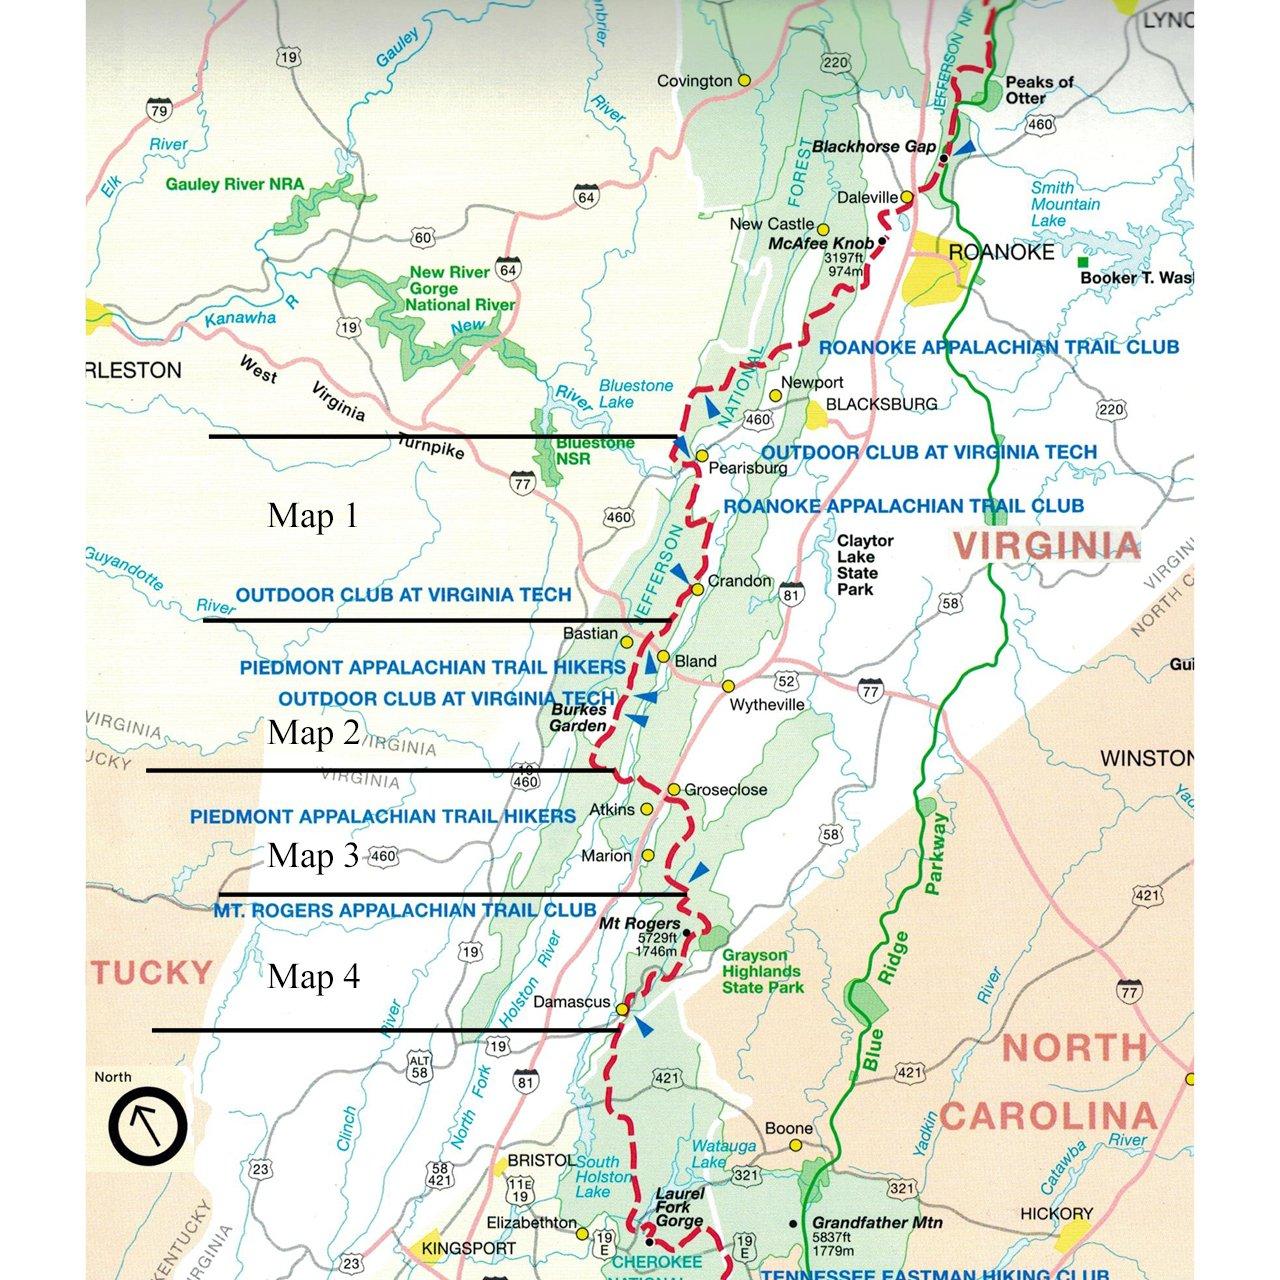 Official Southwest Virginia Appalachian Trail Maps Appalachian Trail